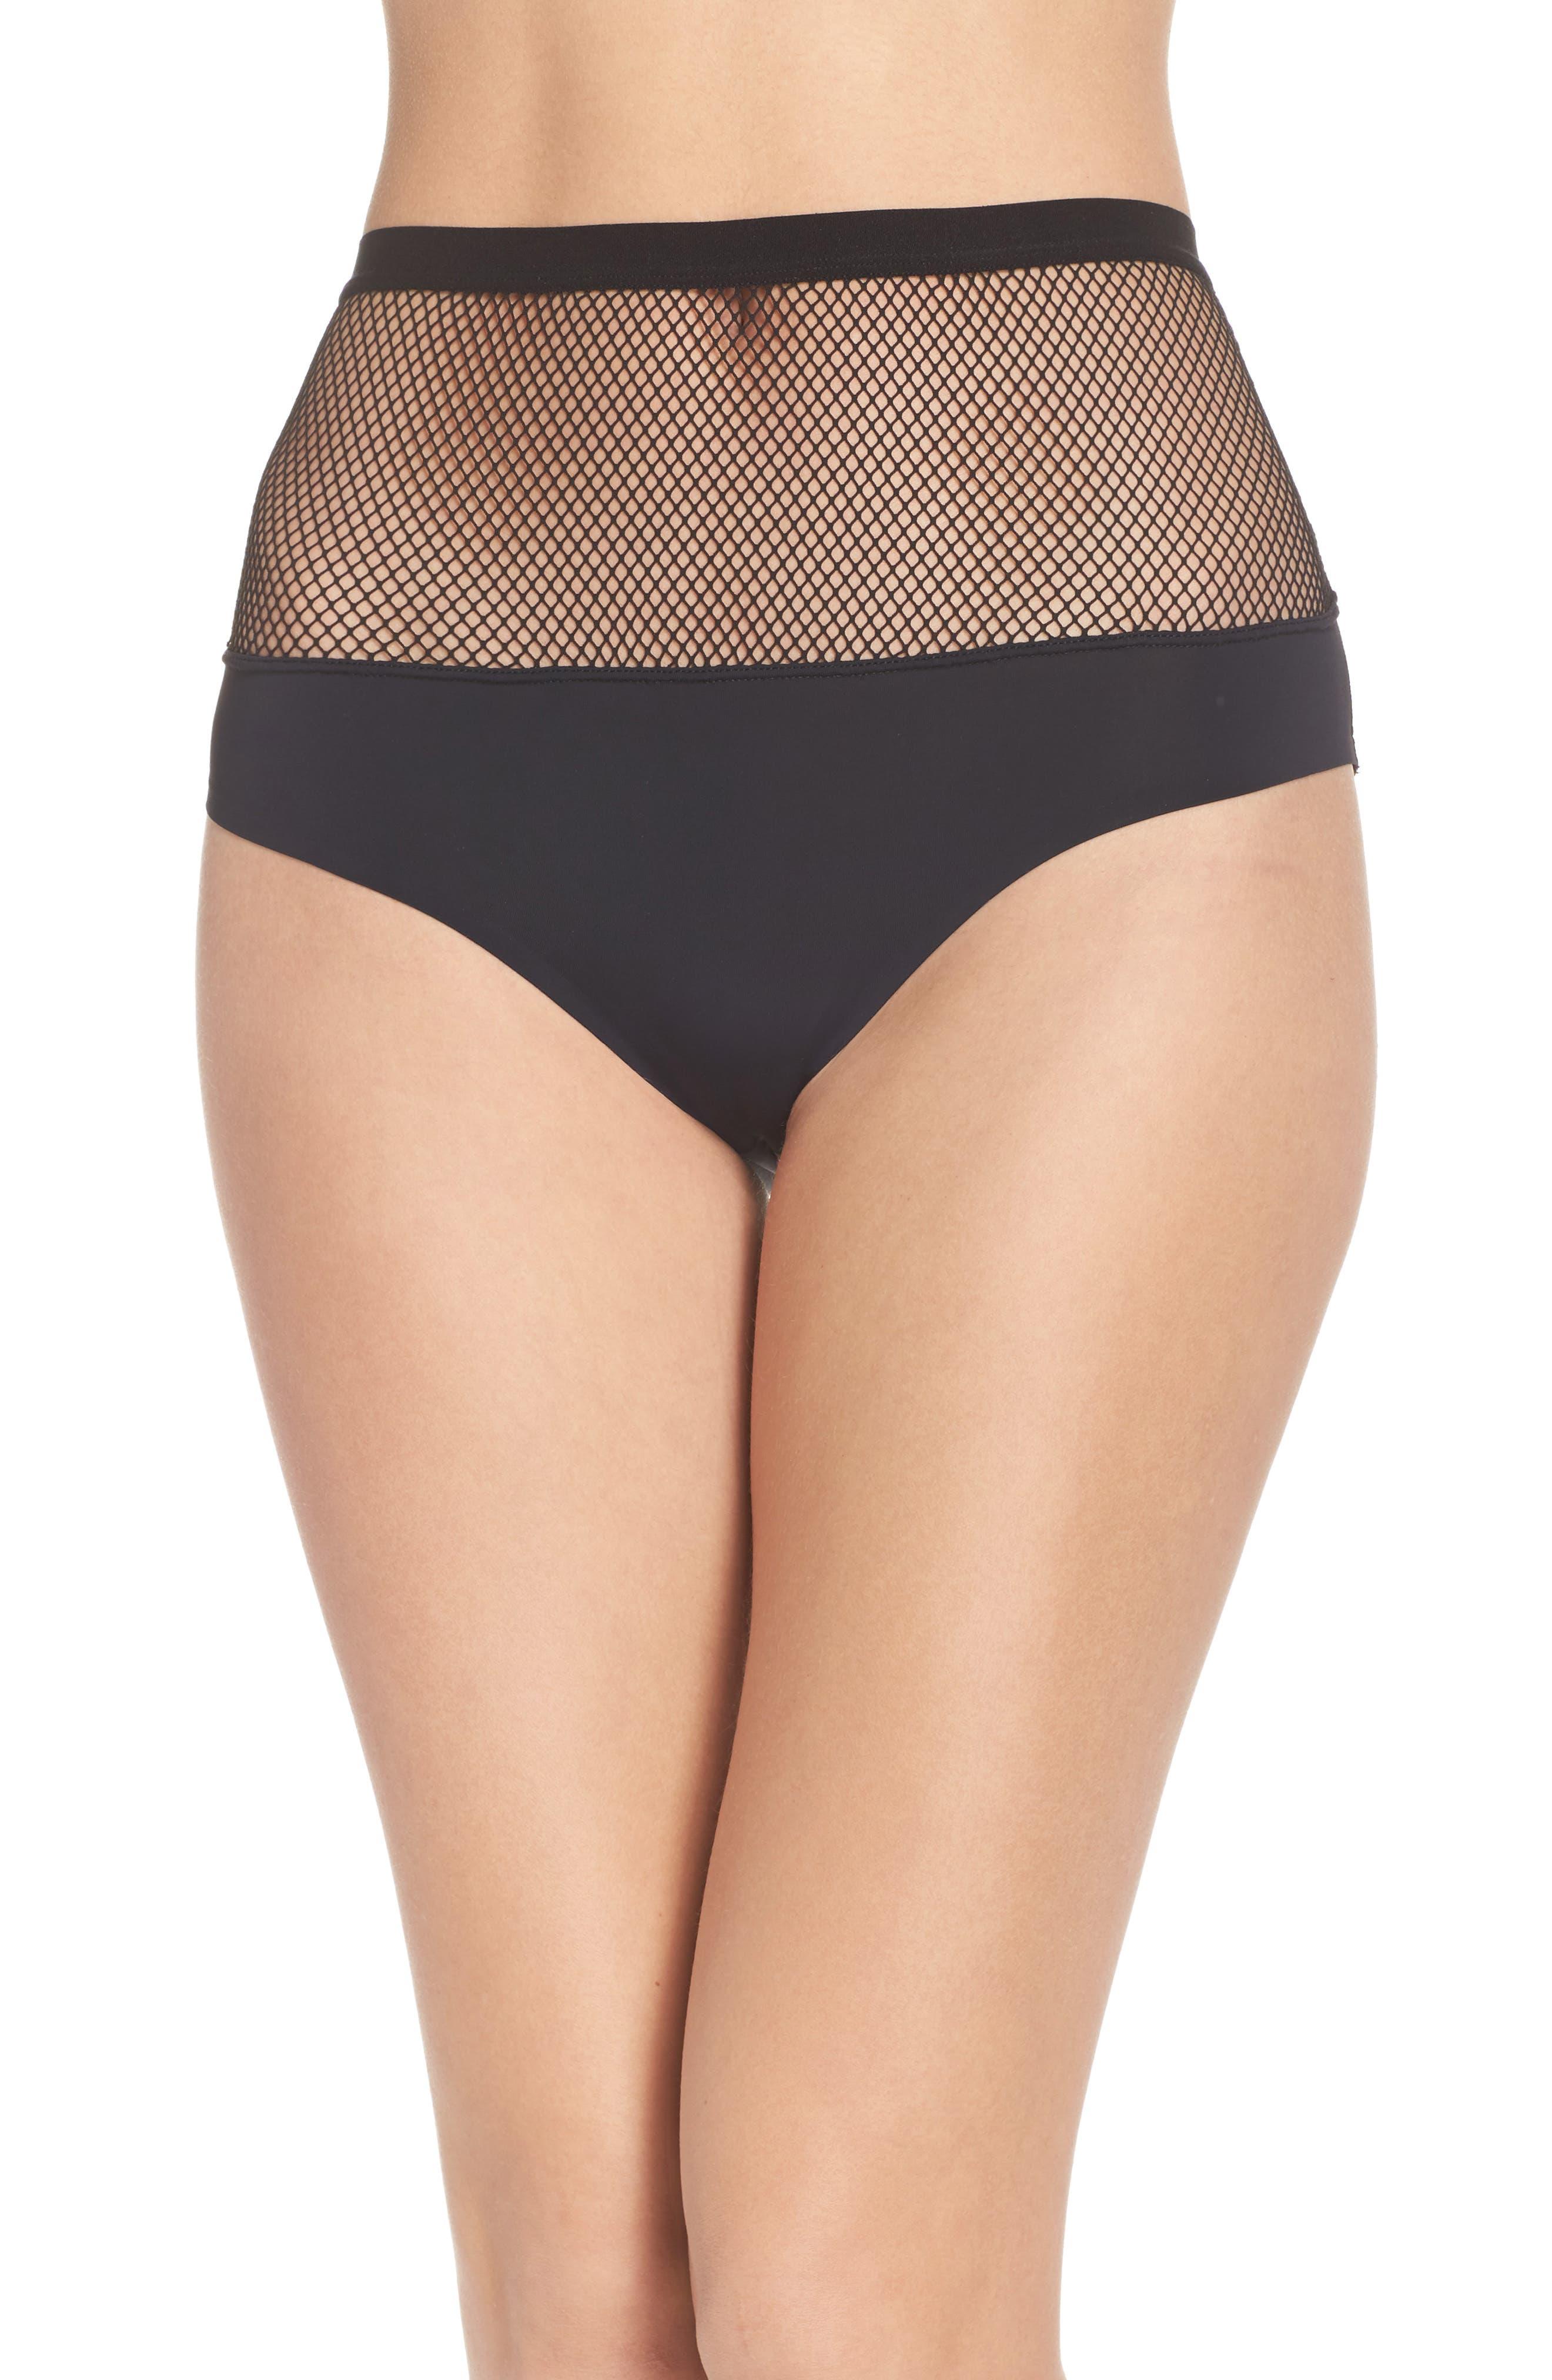 Honeydew Fishnet Hipster Panties,                         Main,                         color, 001